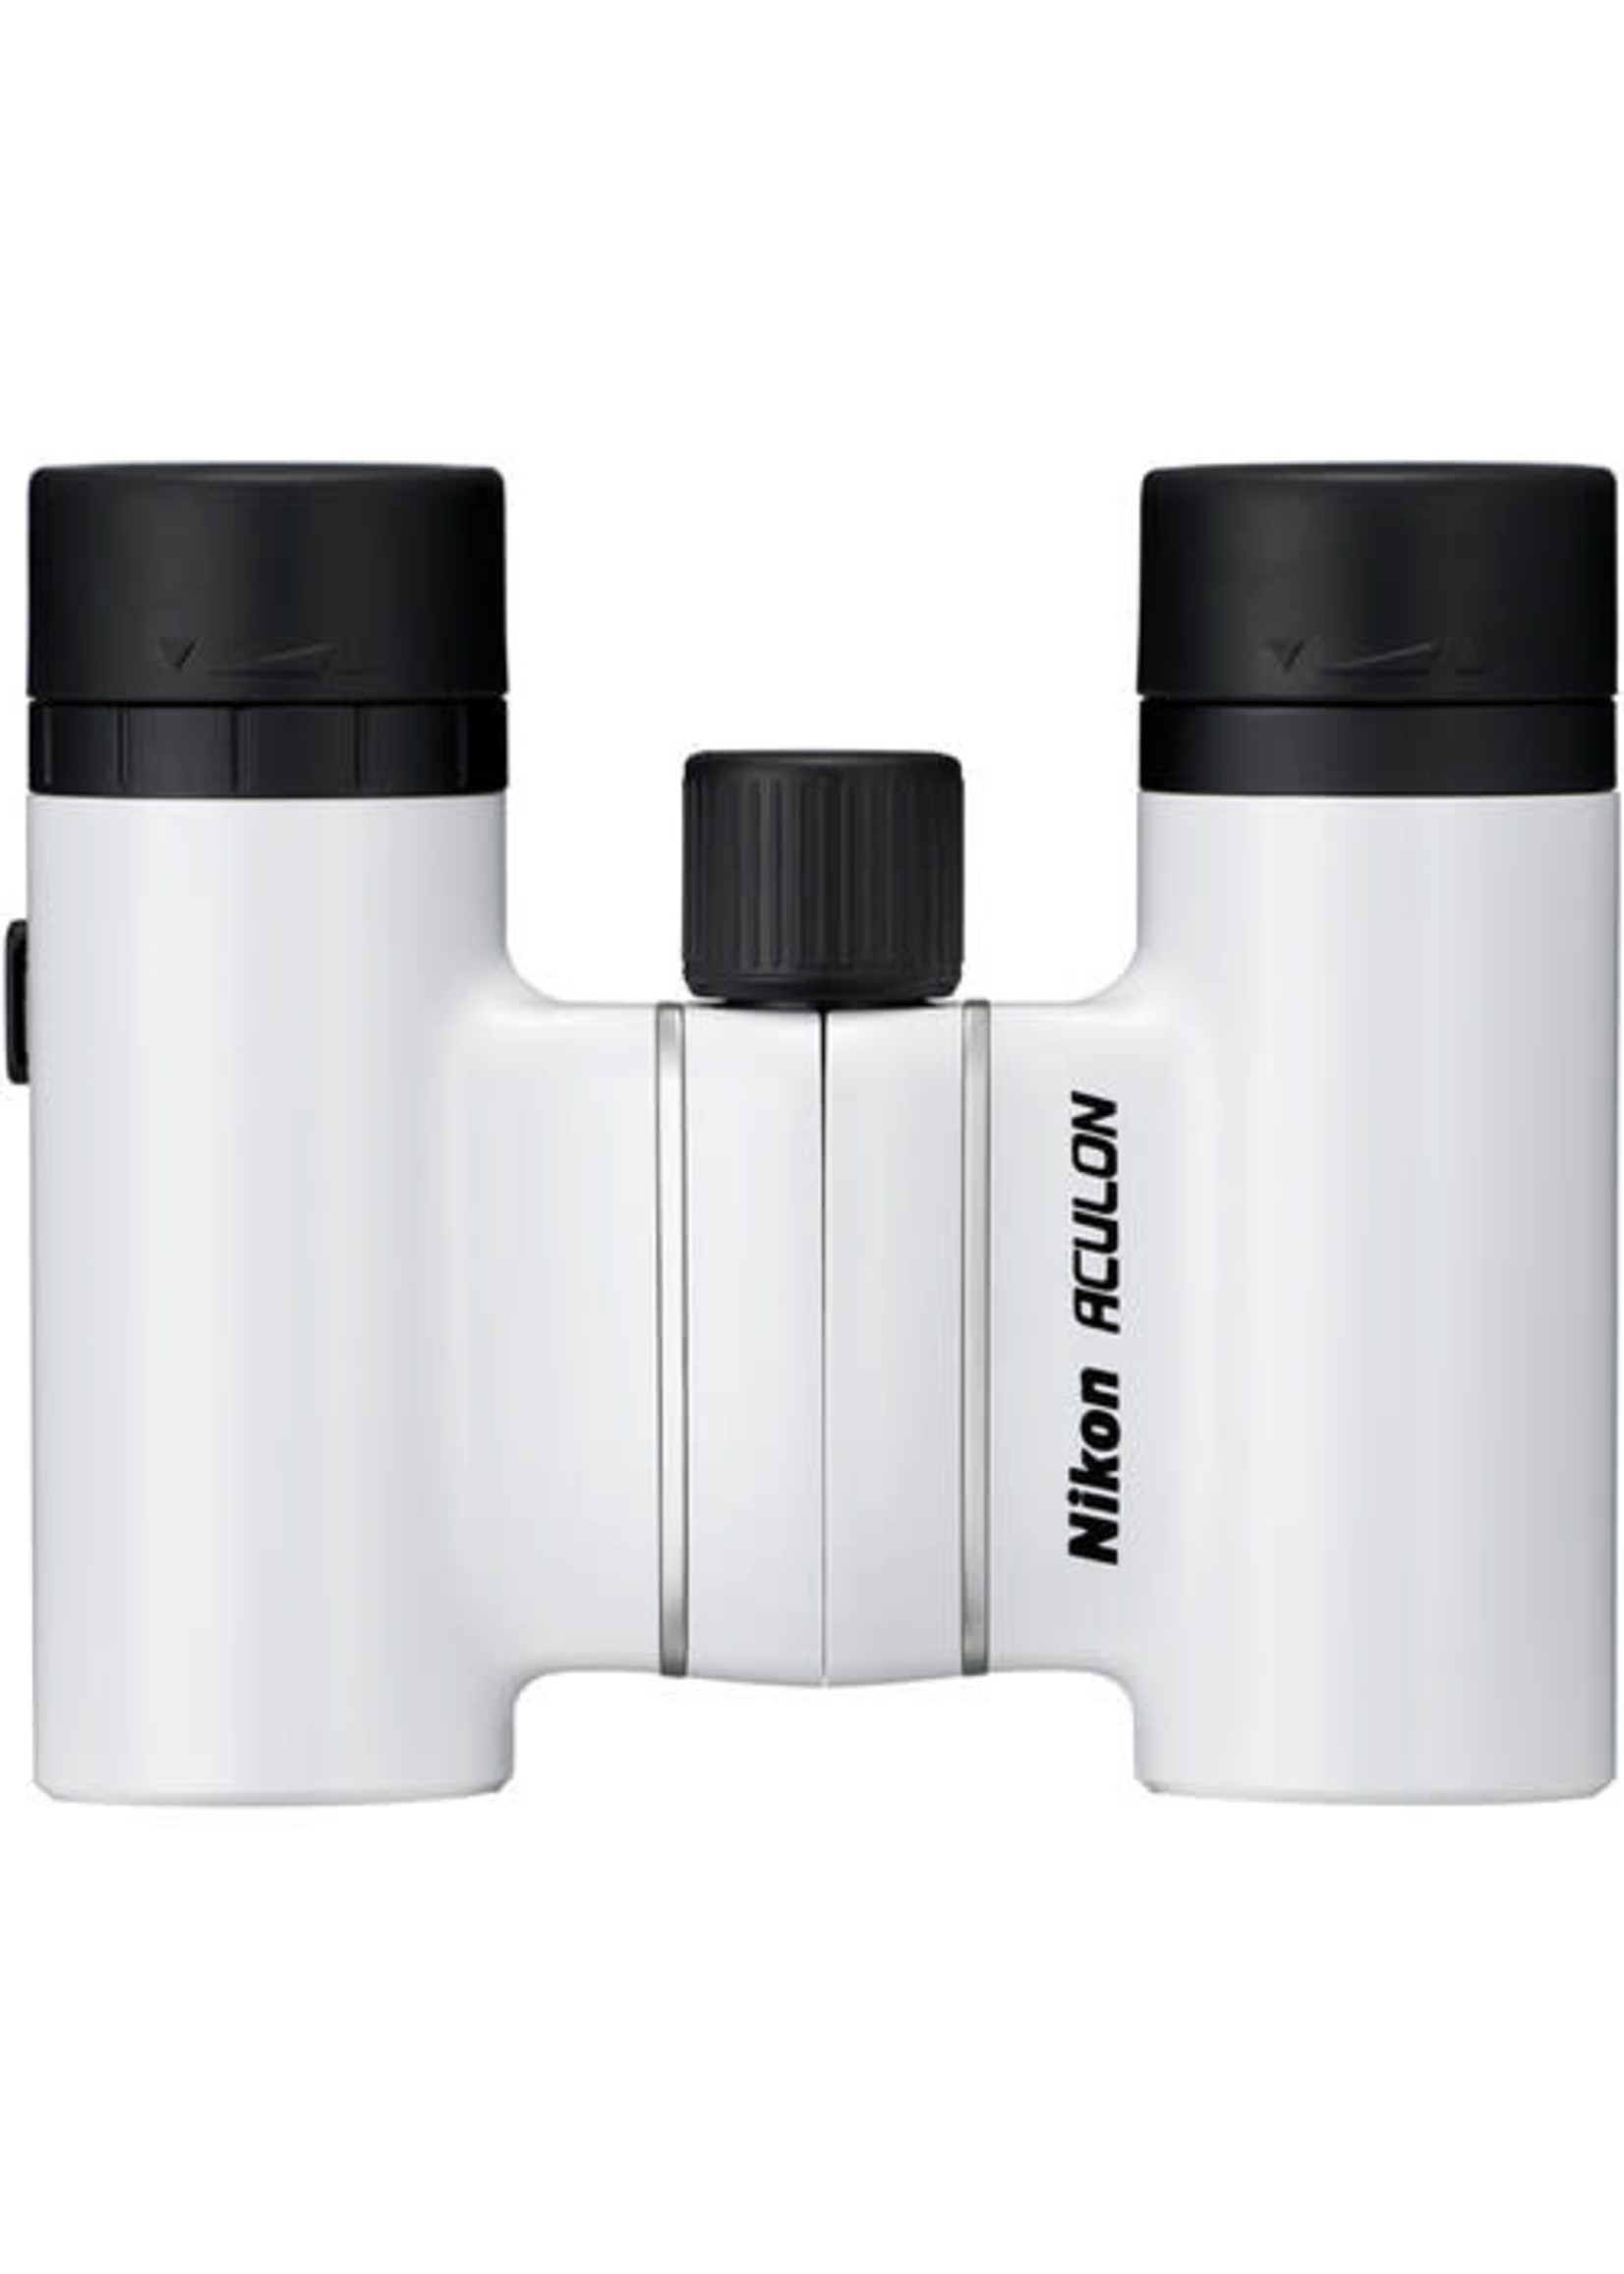 ACULON T02 8x21 WHITE